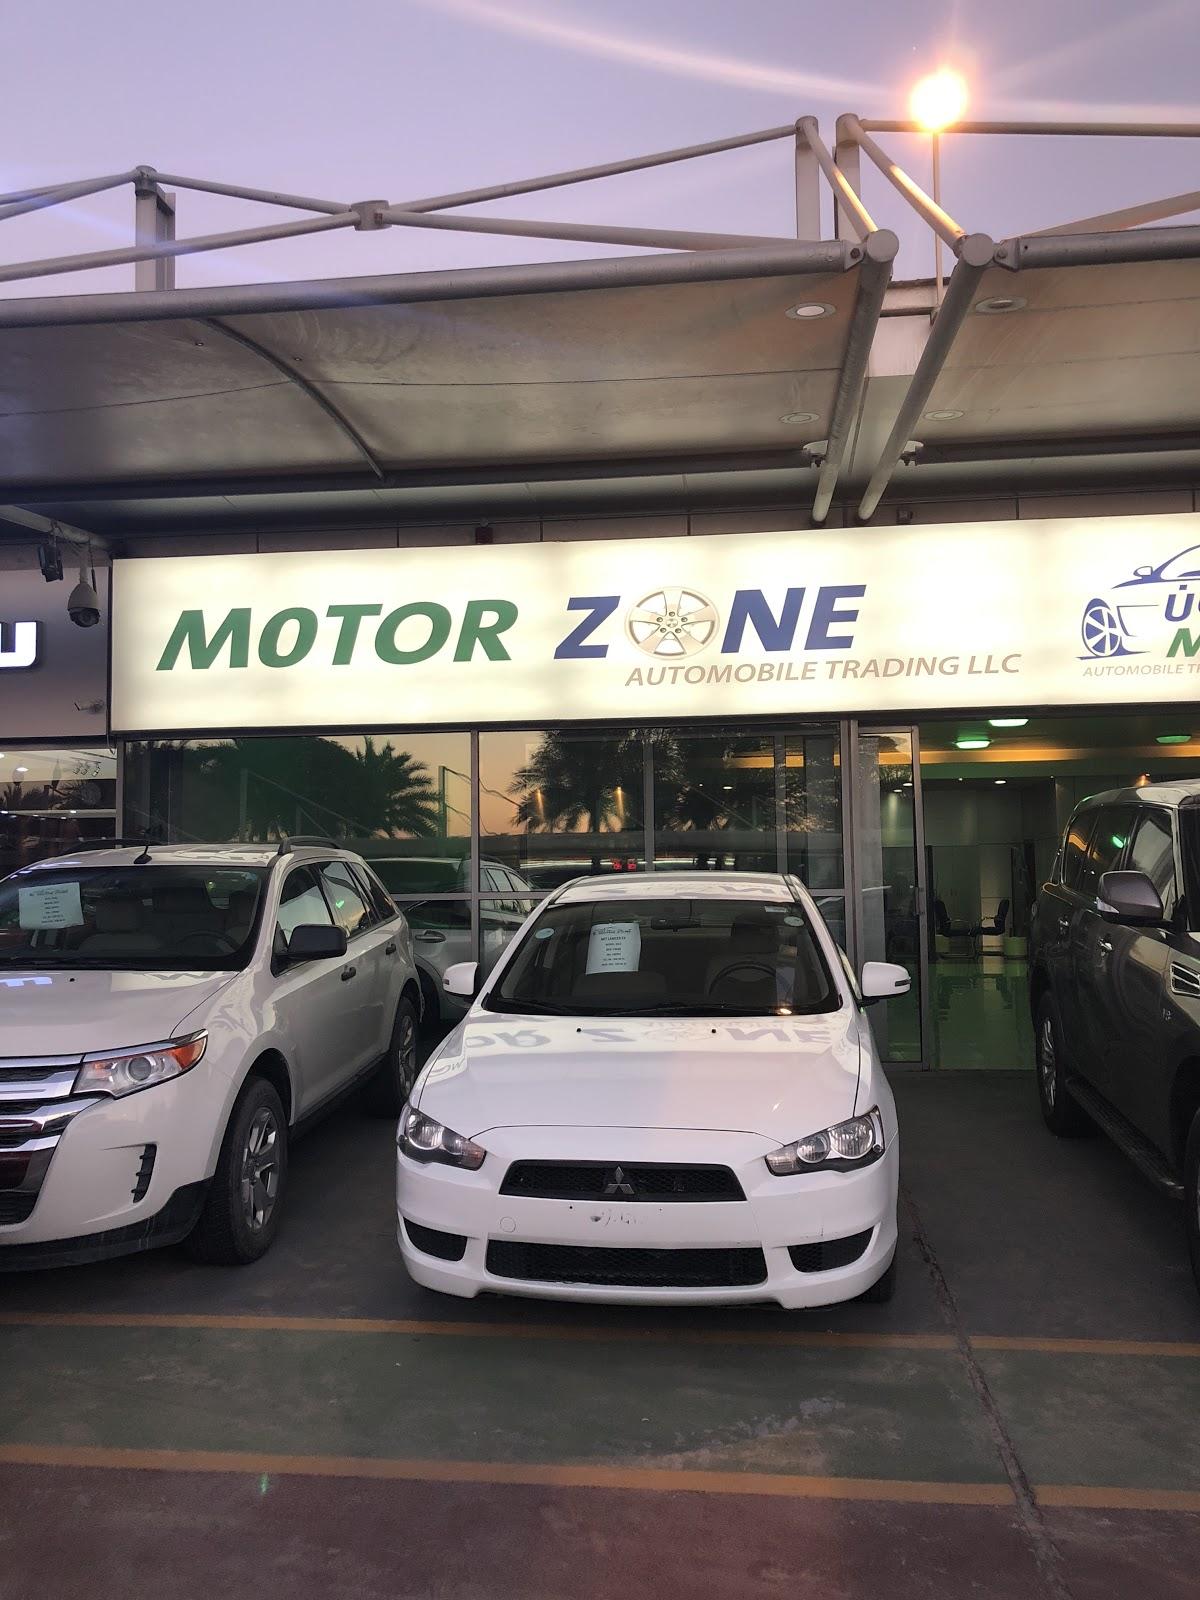 Motorzone Automobiles Trading LLC